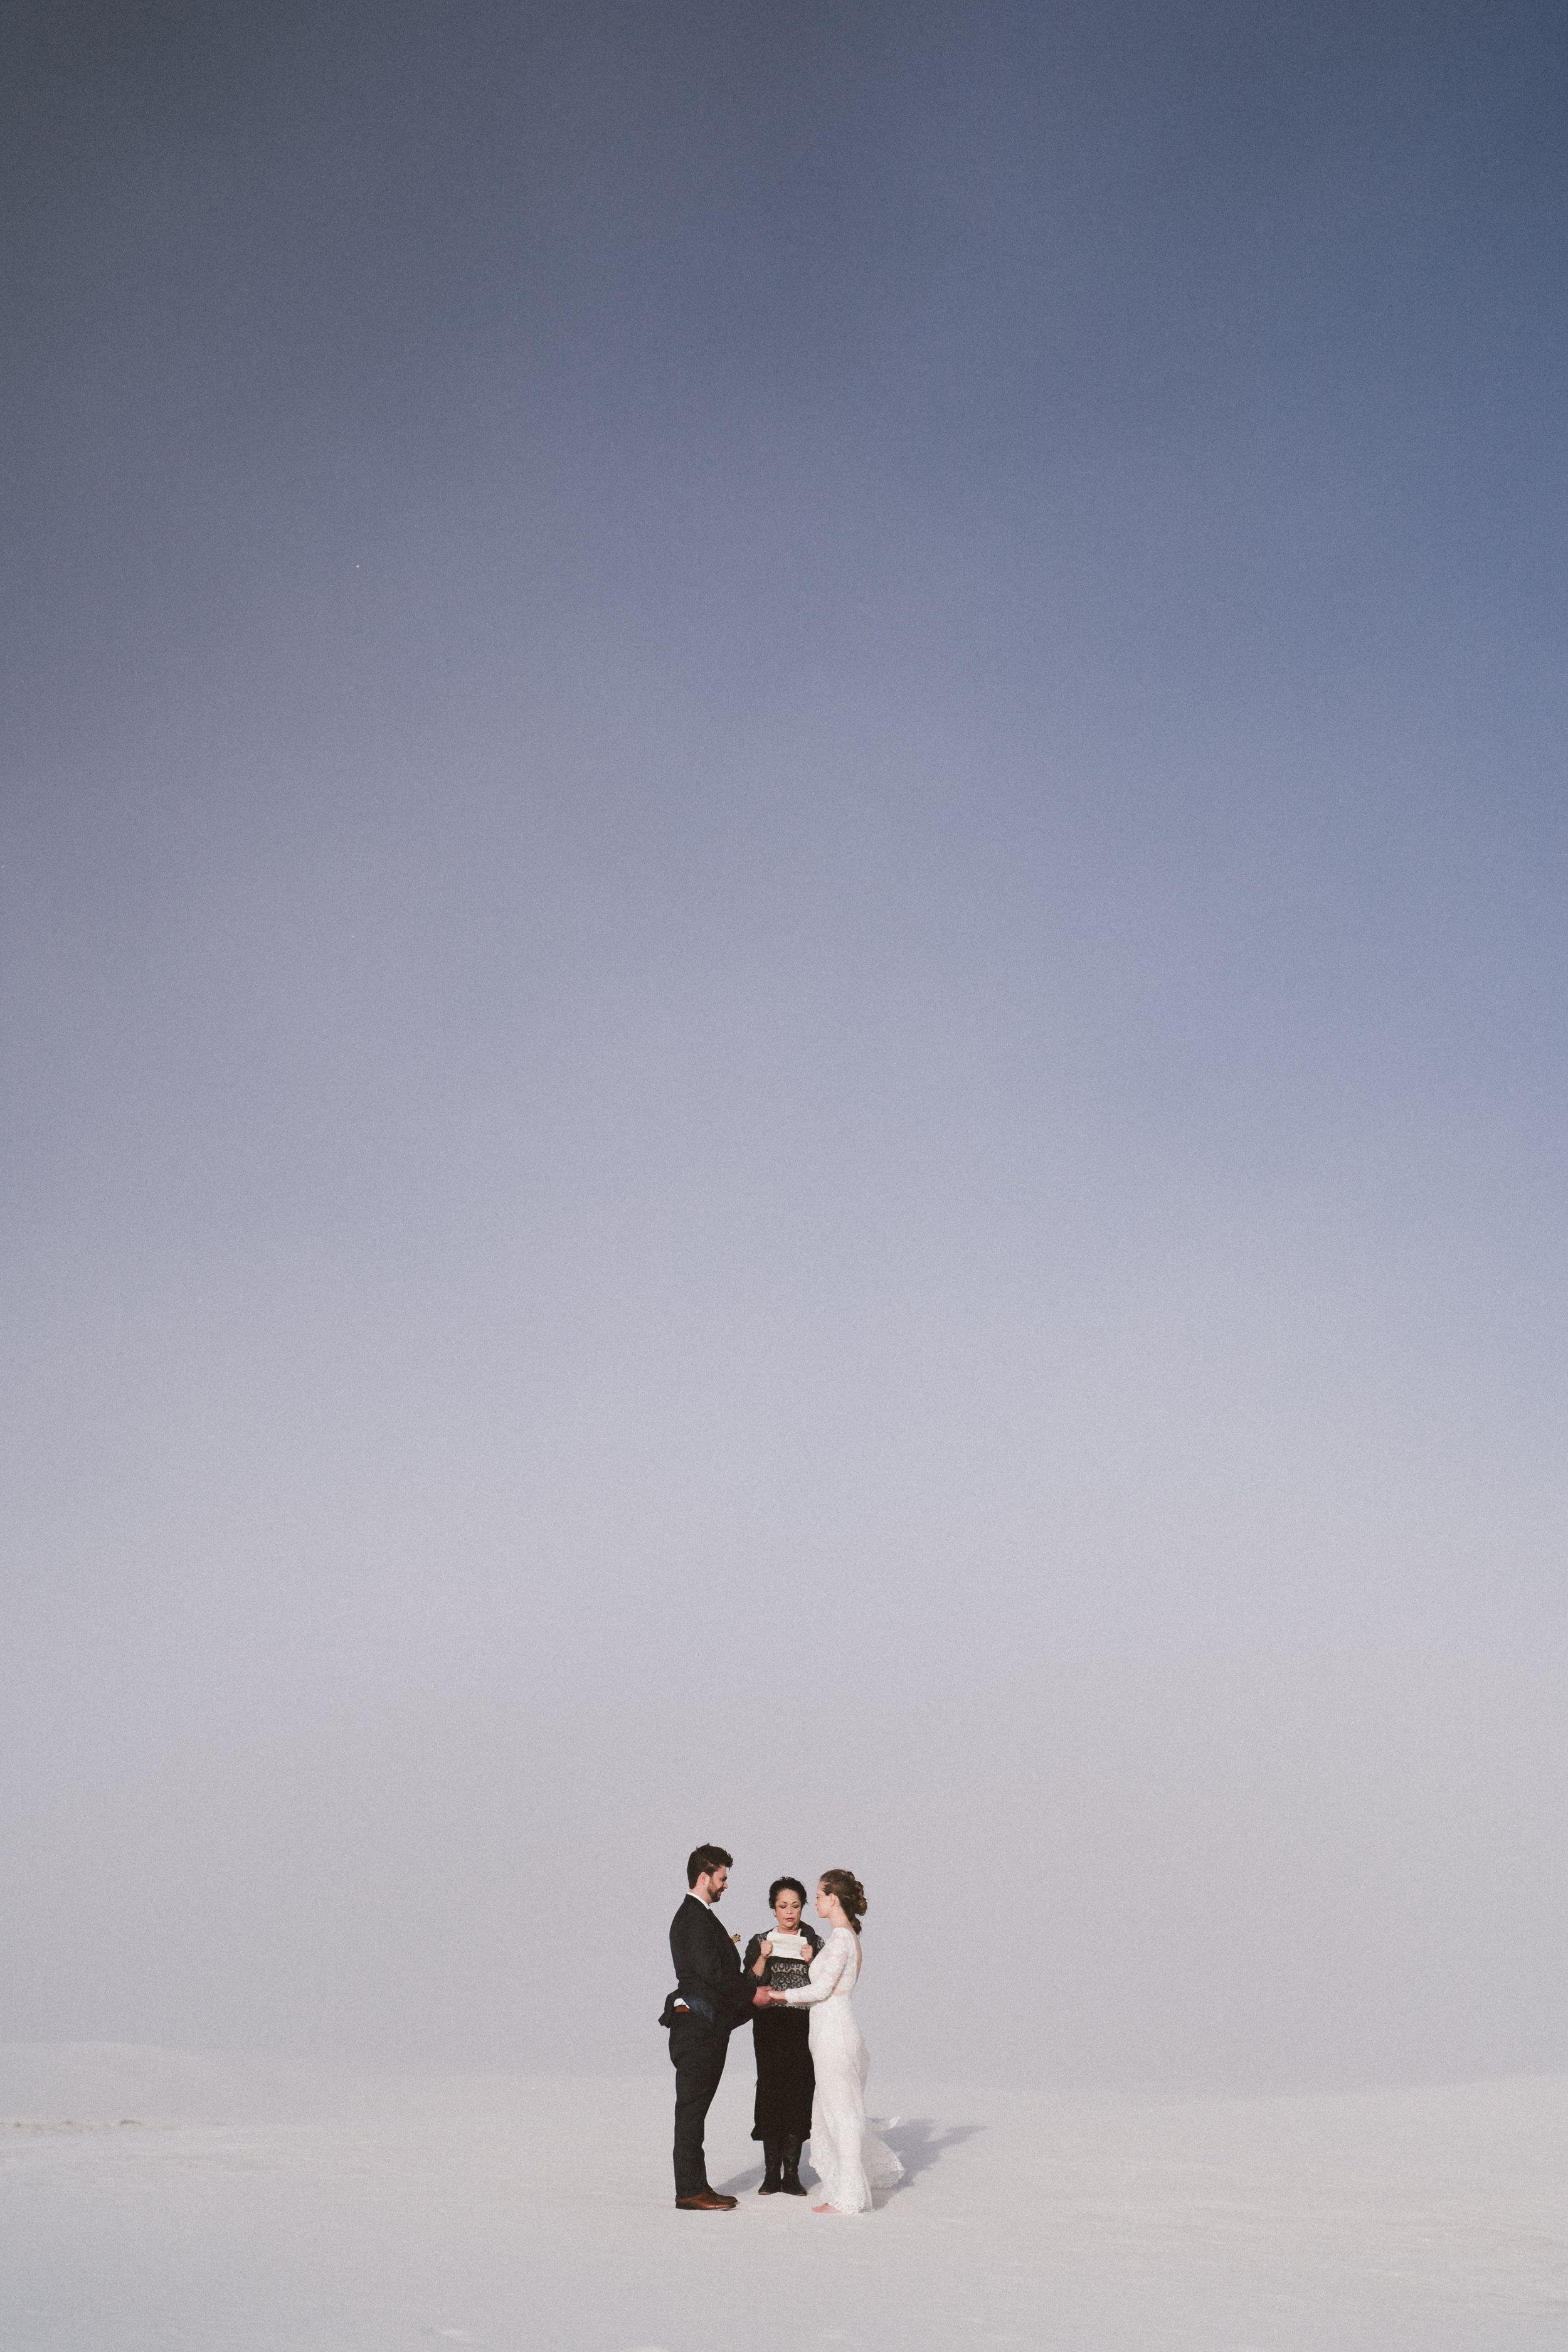 Tony-Gambino-Photography-1093.jpg